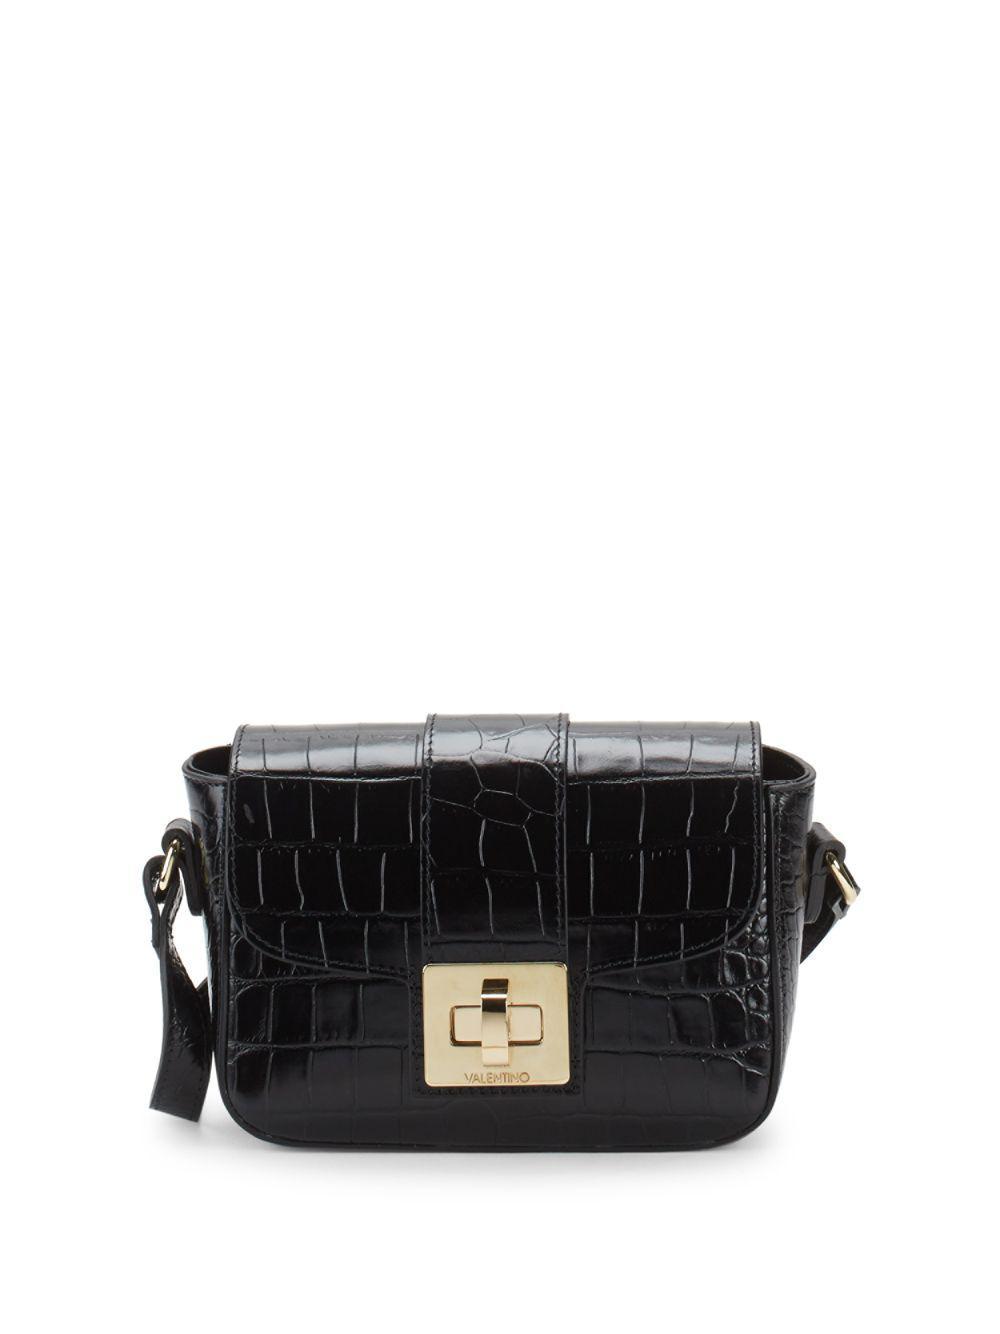 cd90aa5aea Lyst - Valentino By Mario Valentino Yasmin Croc-embossed Leather ...